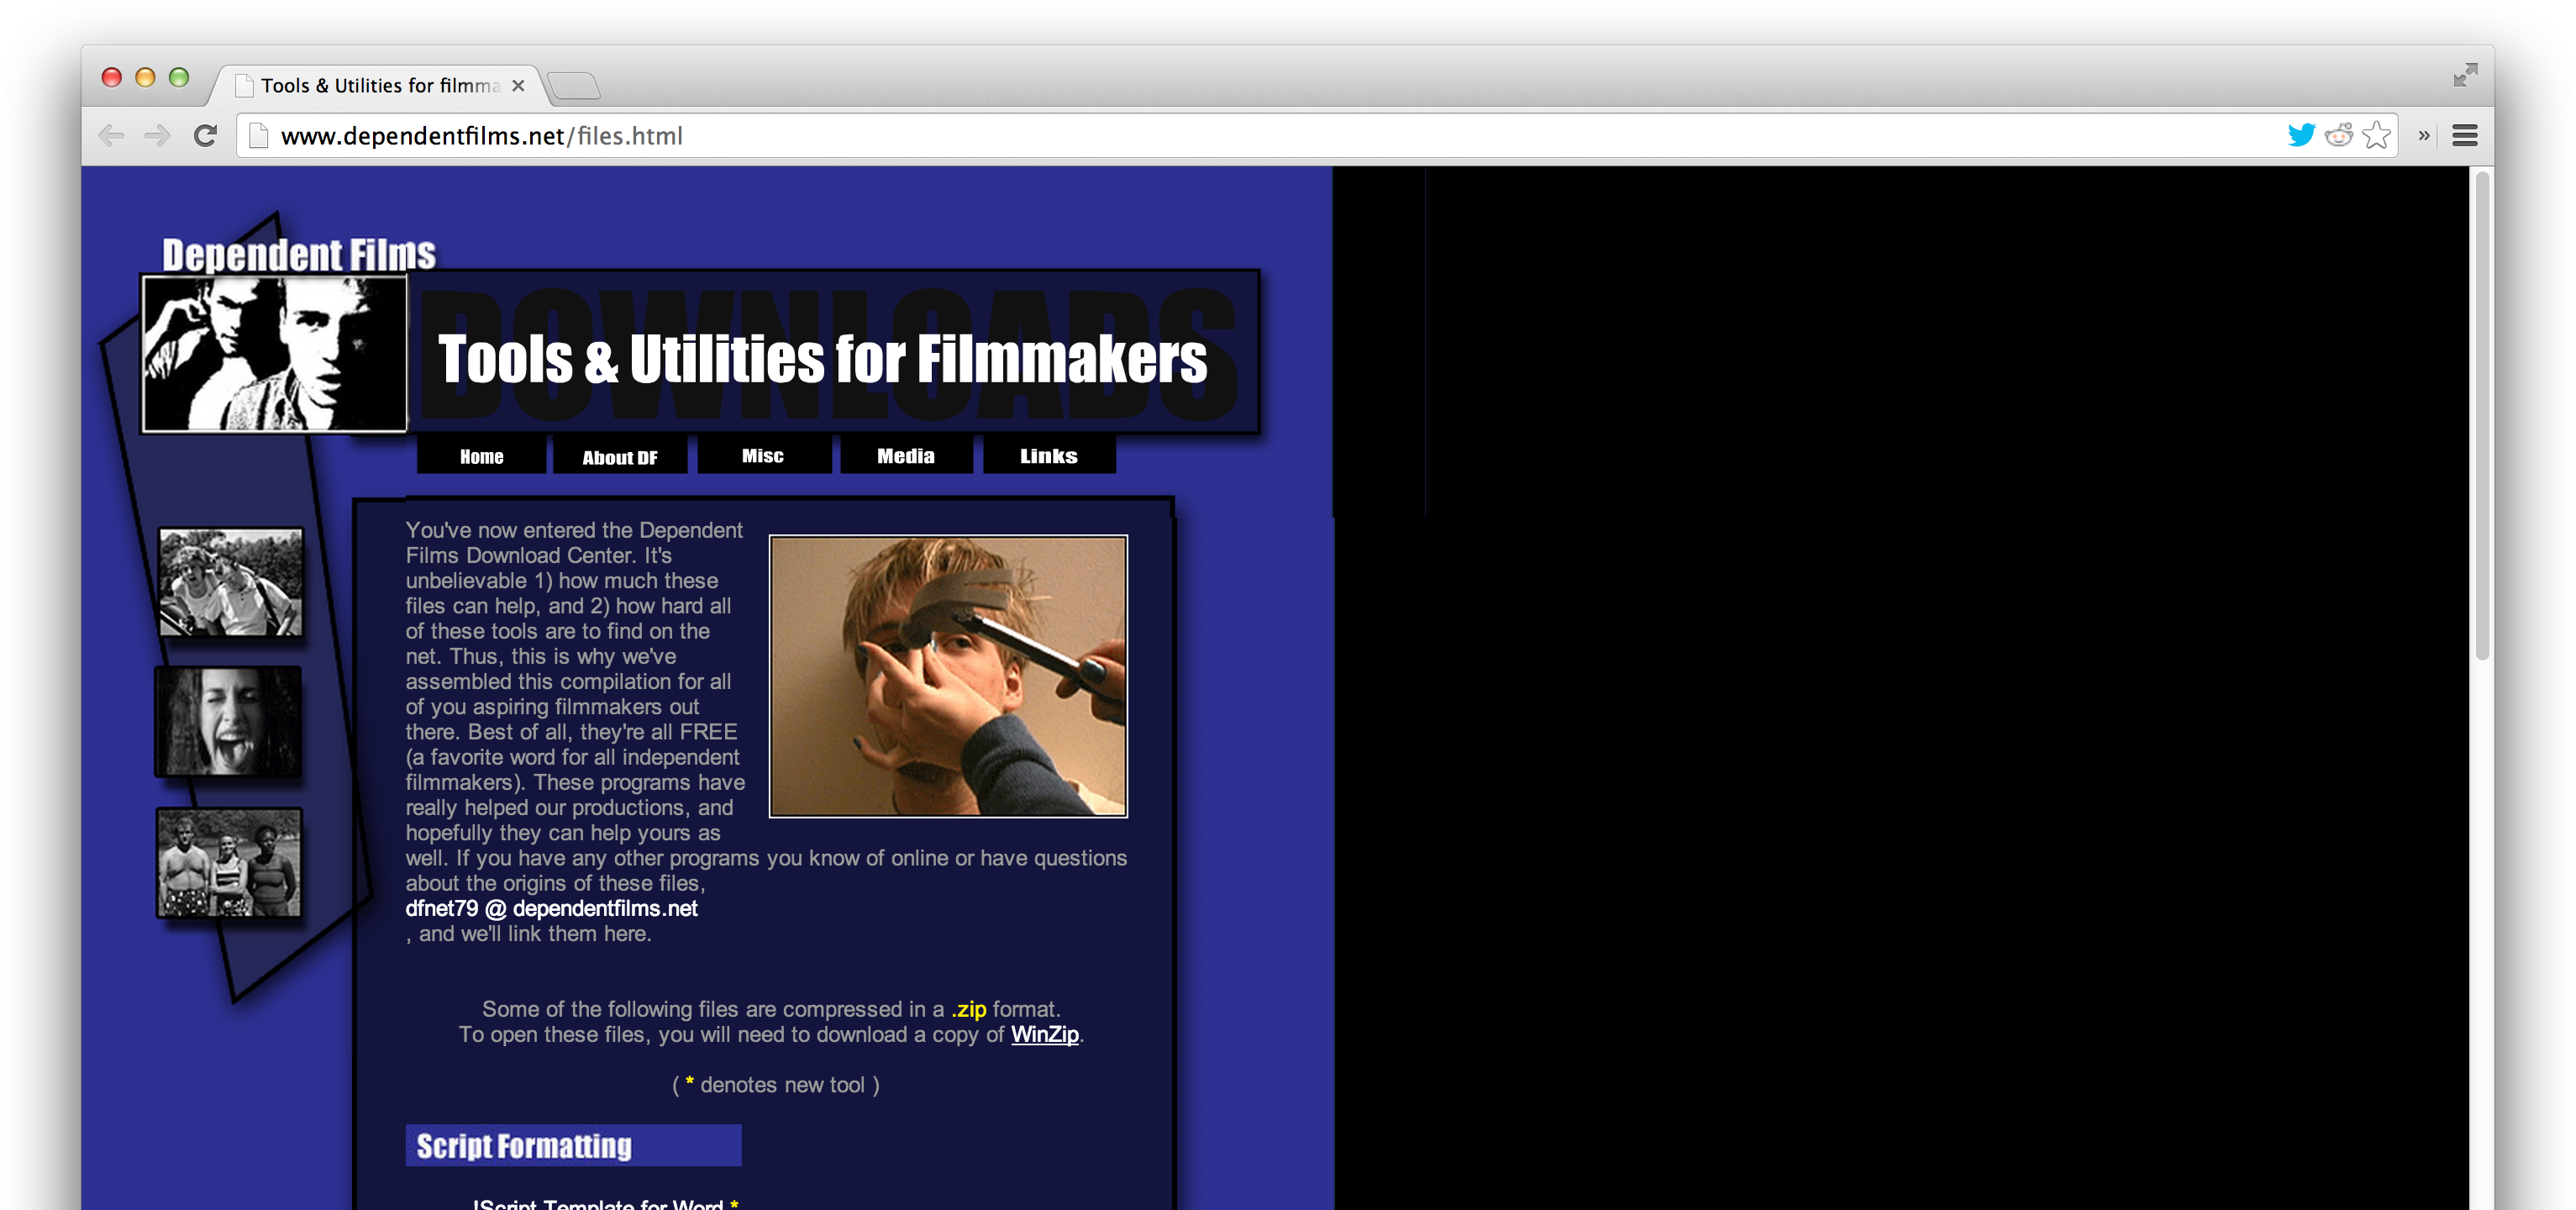 Dependent Films